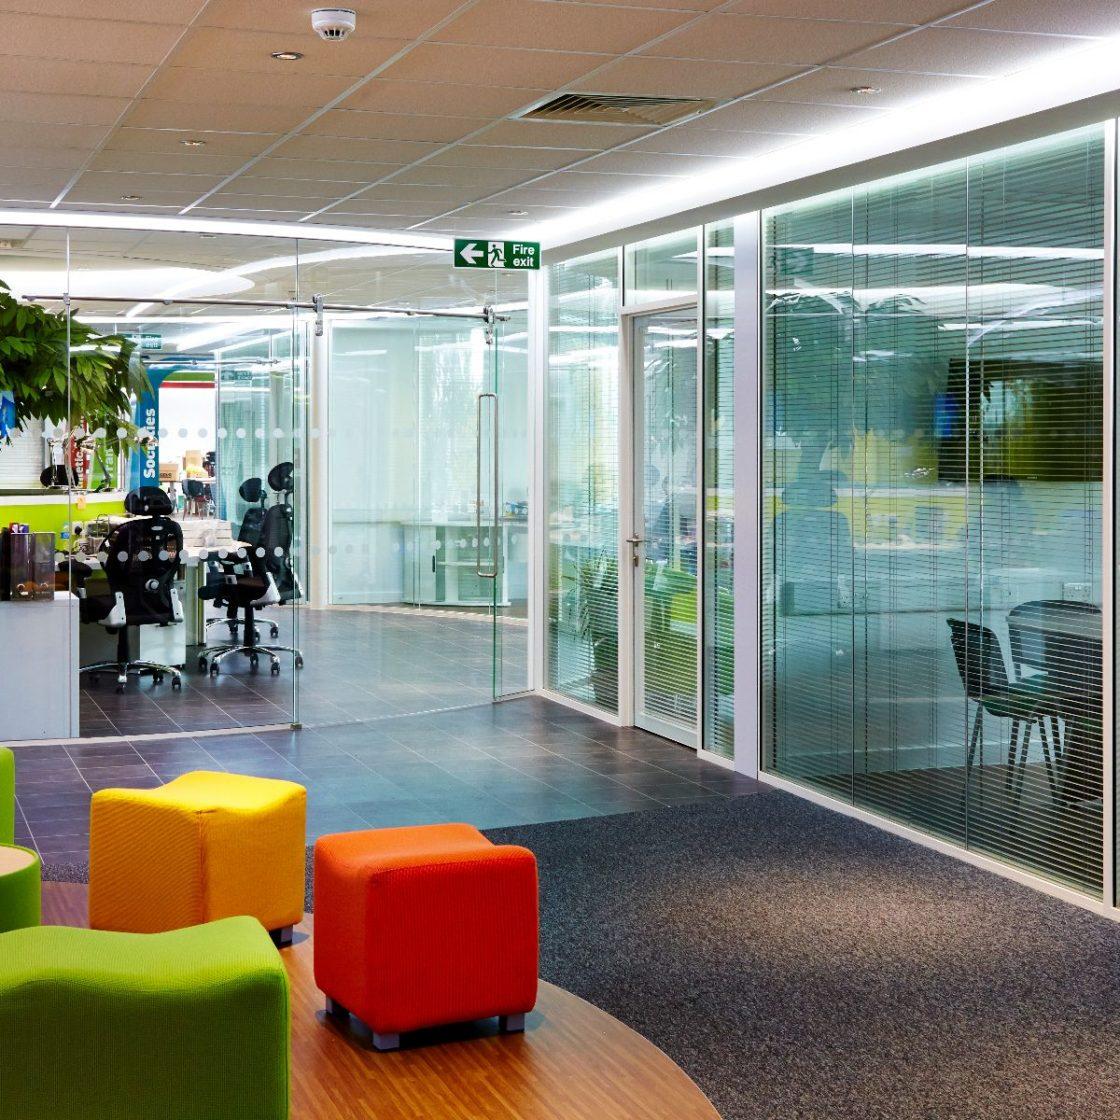 Glass   Office meeting rooms   Single Glazing   Double Glazing   Doors   Acoustics